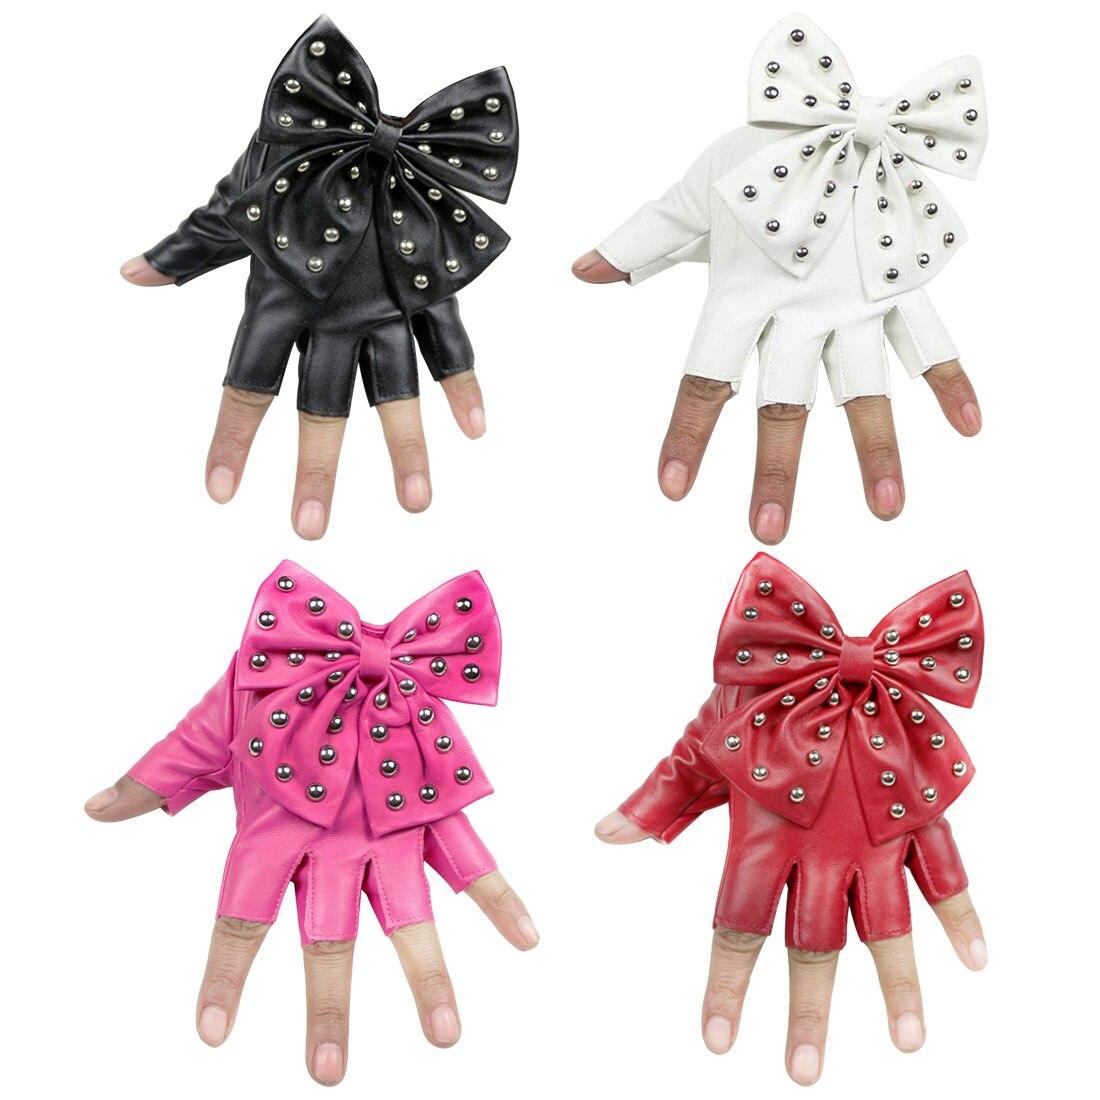 Womens Leather Gloves Black Fingerless PU Big Bow Mittens Half finger Ladies Luvas Dancing